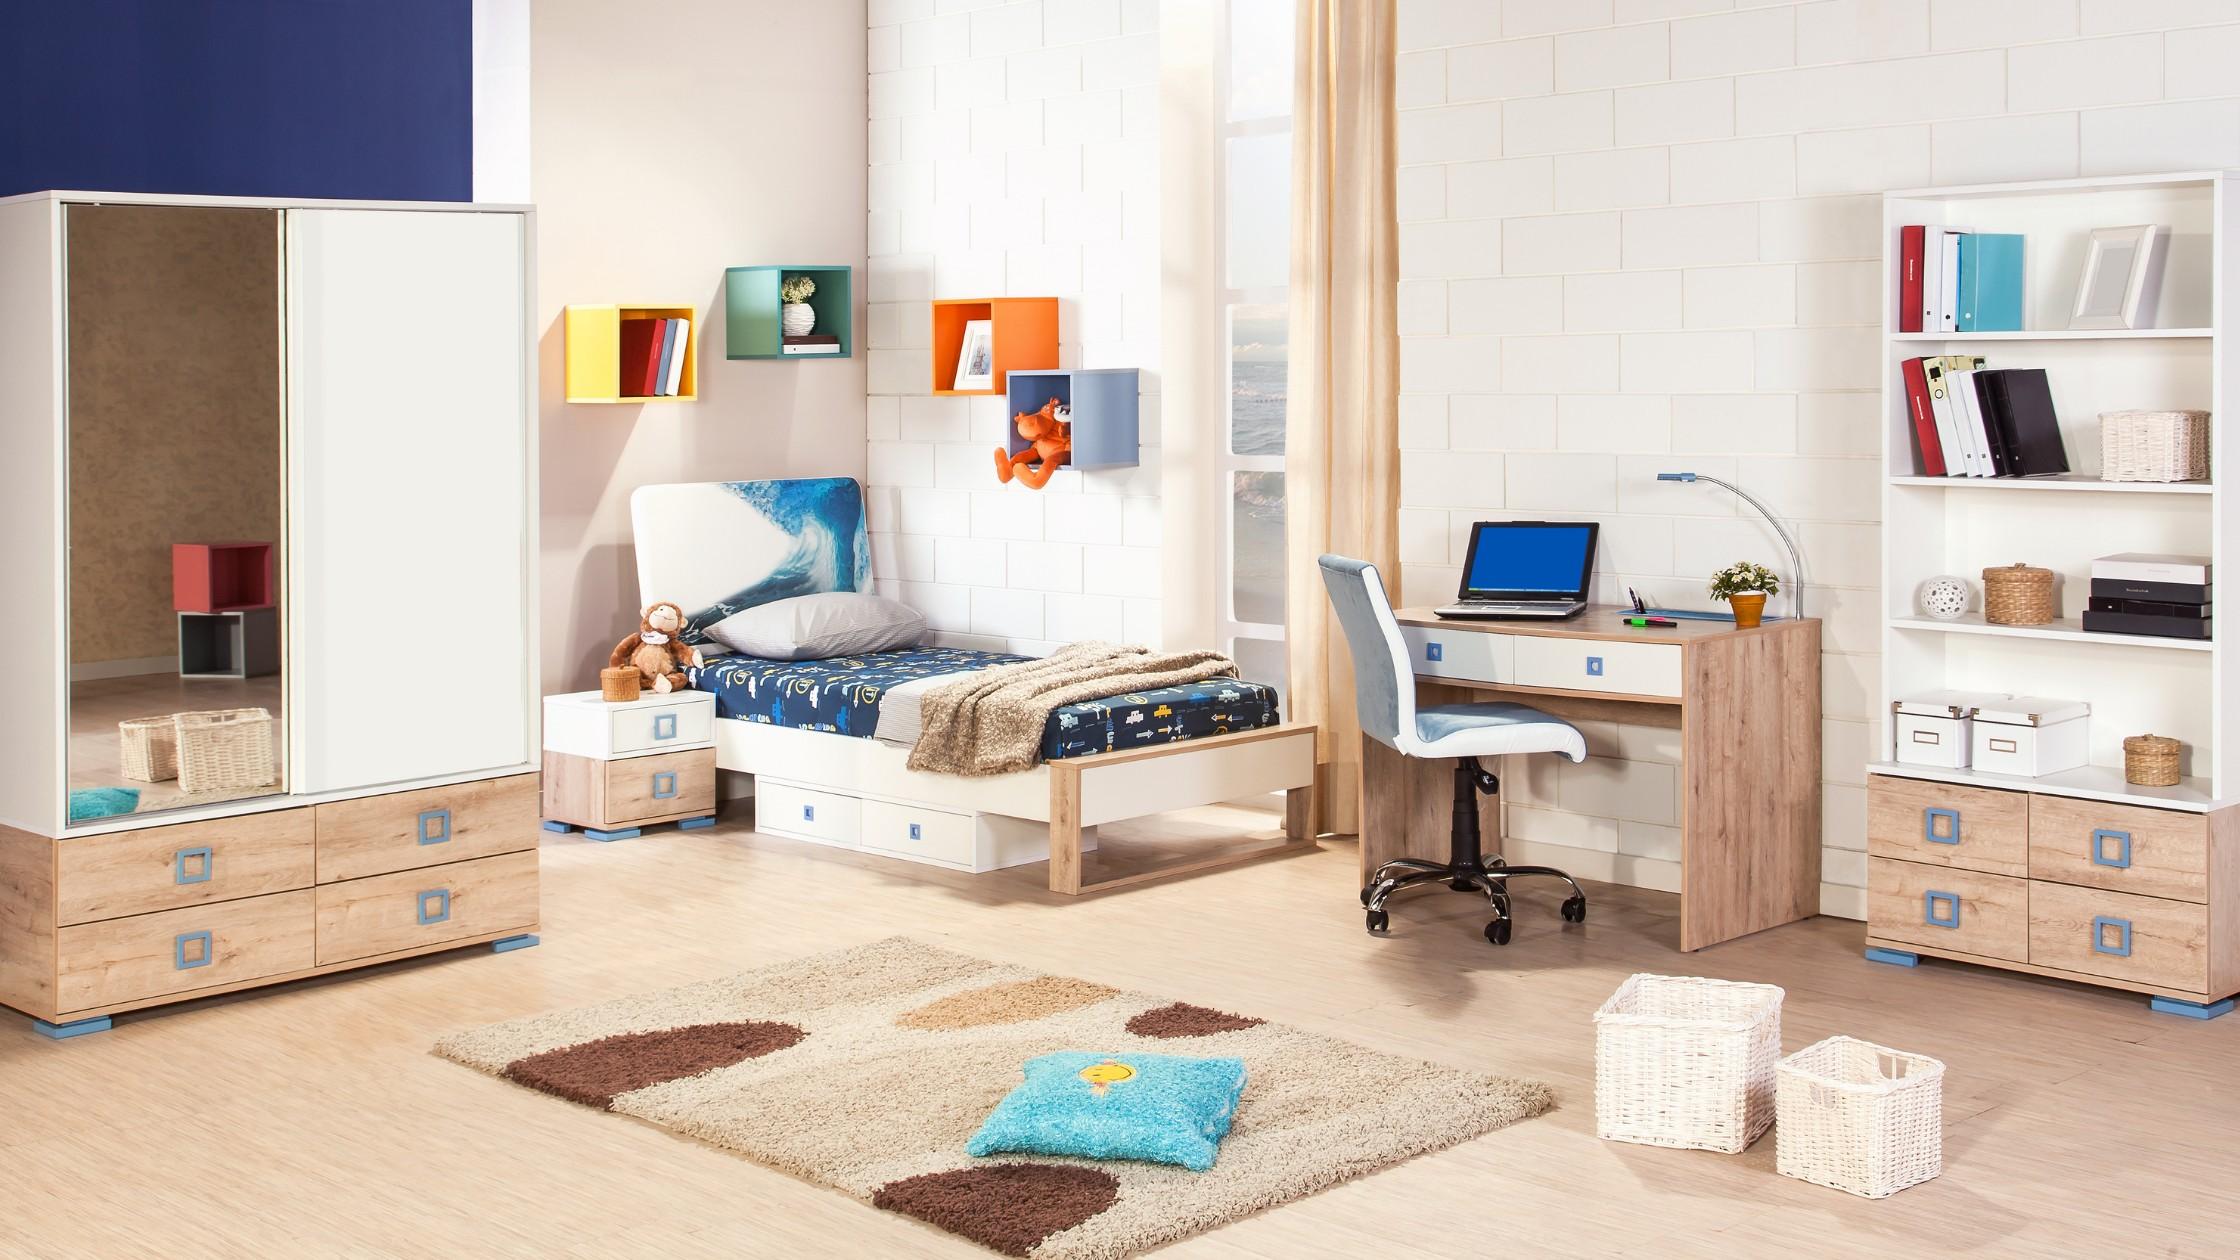 decor and designing